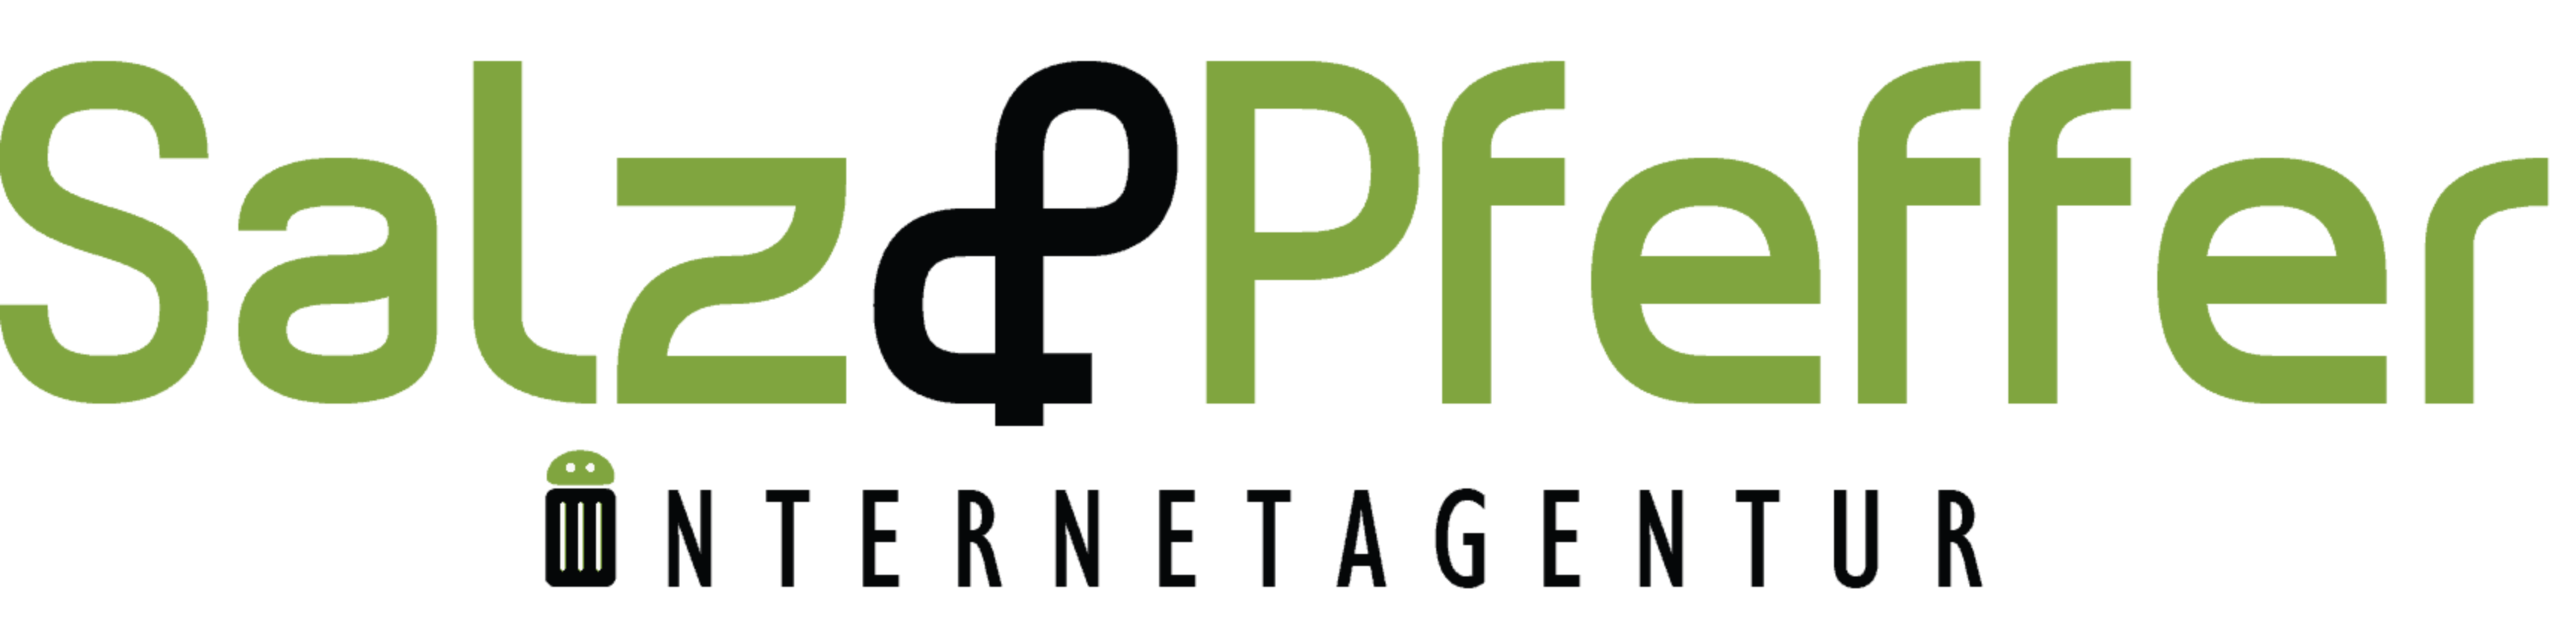 Internetagentur | Salz & Pfeffer